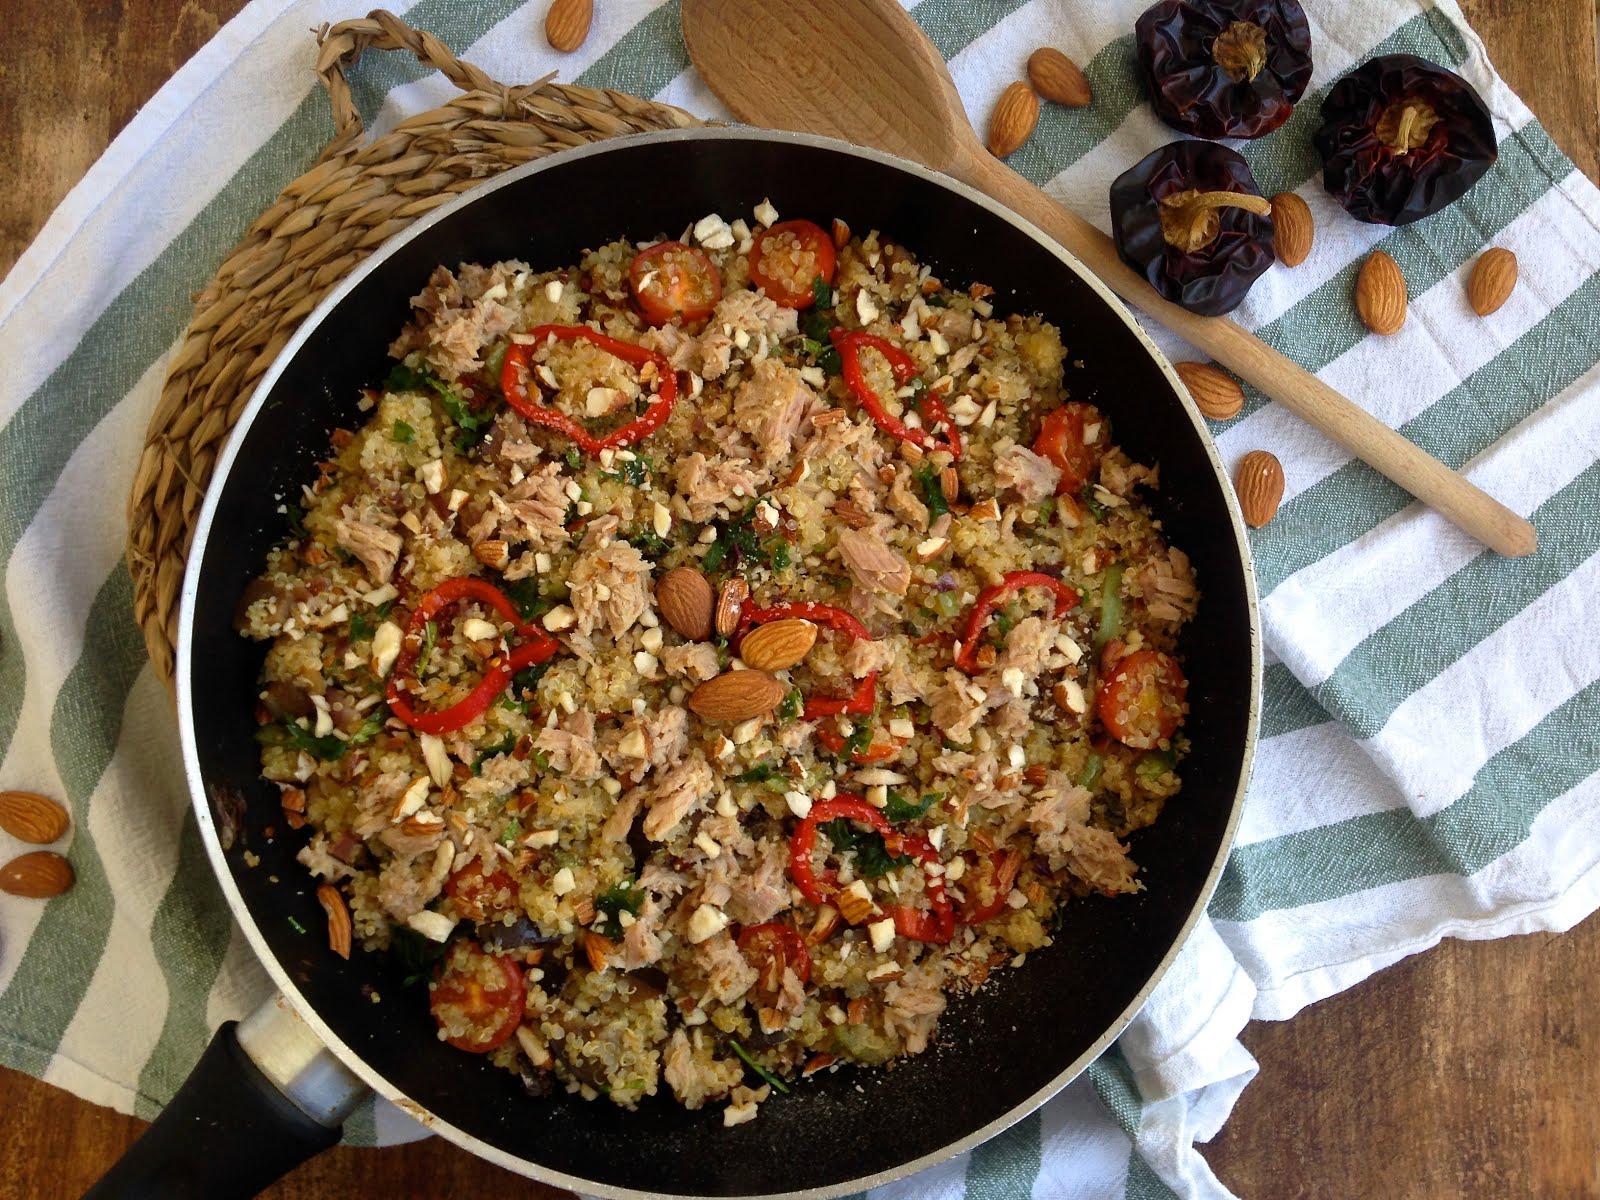 Salteado de quinoa con verduras y at n - Cocinar quinoa con verduras ...